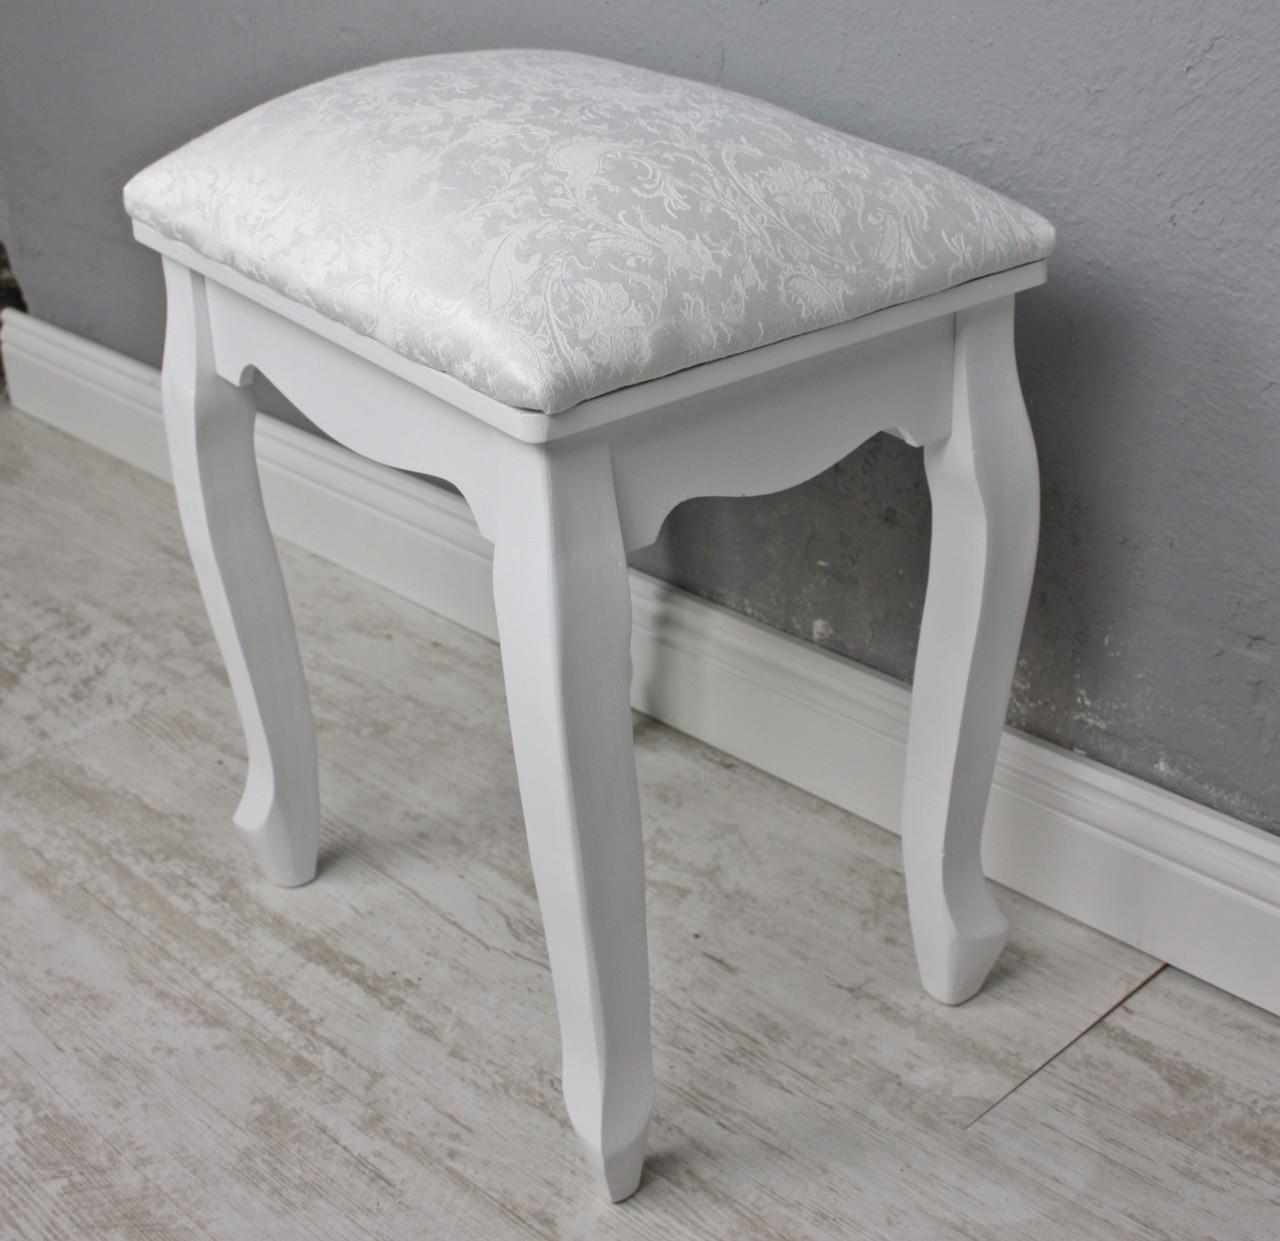 hocker schemel wei holz. Black Bedroom Furniture Sets. Home Design Ideas